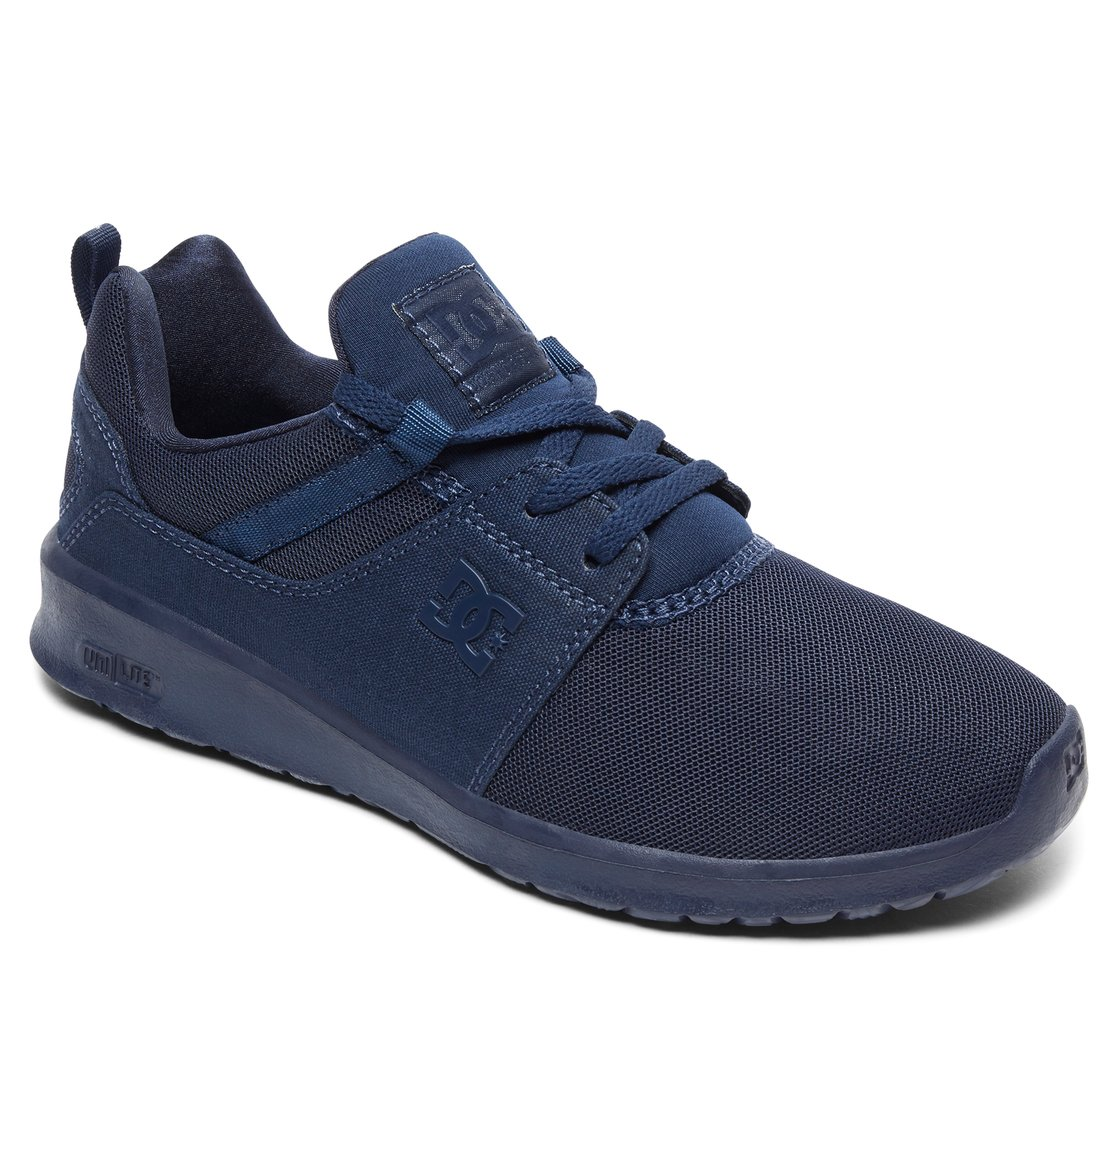 DC-Shoes-Heathrow-Shoes-for-Women-ADJS700021